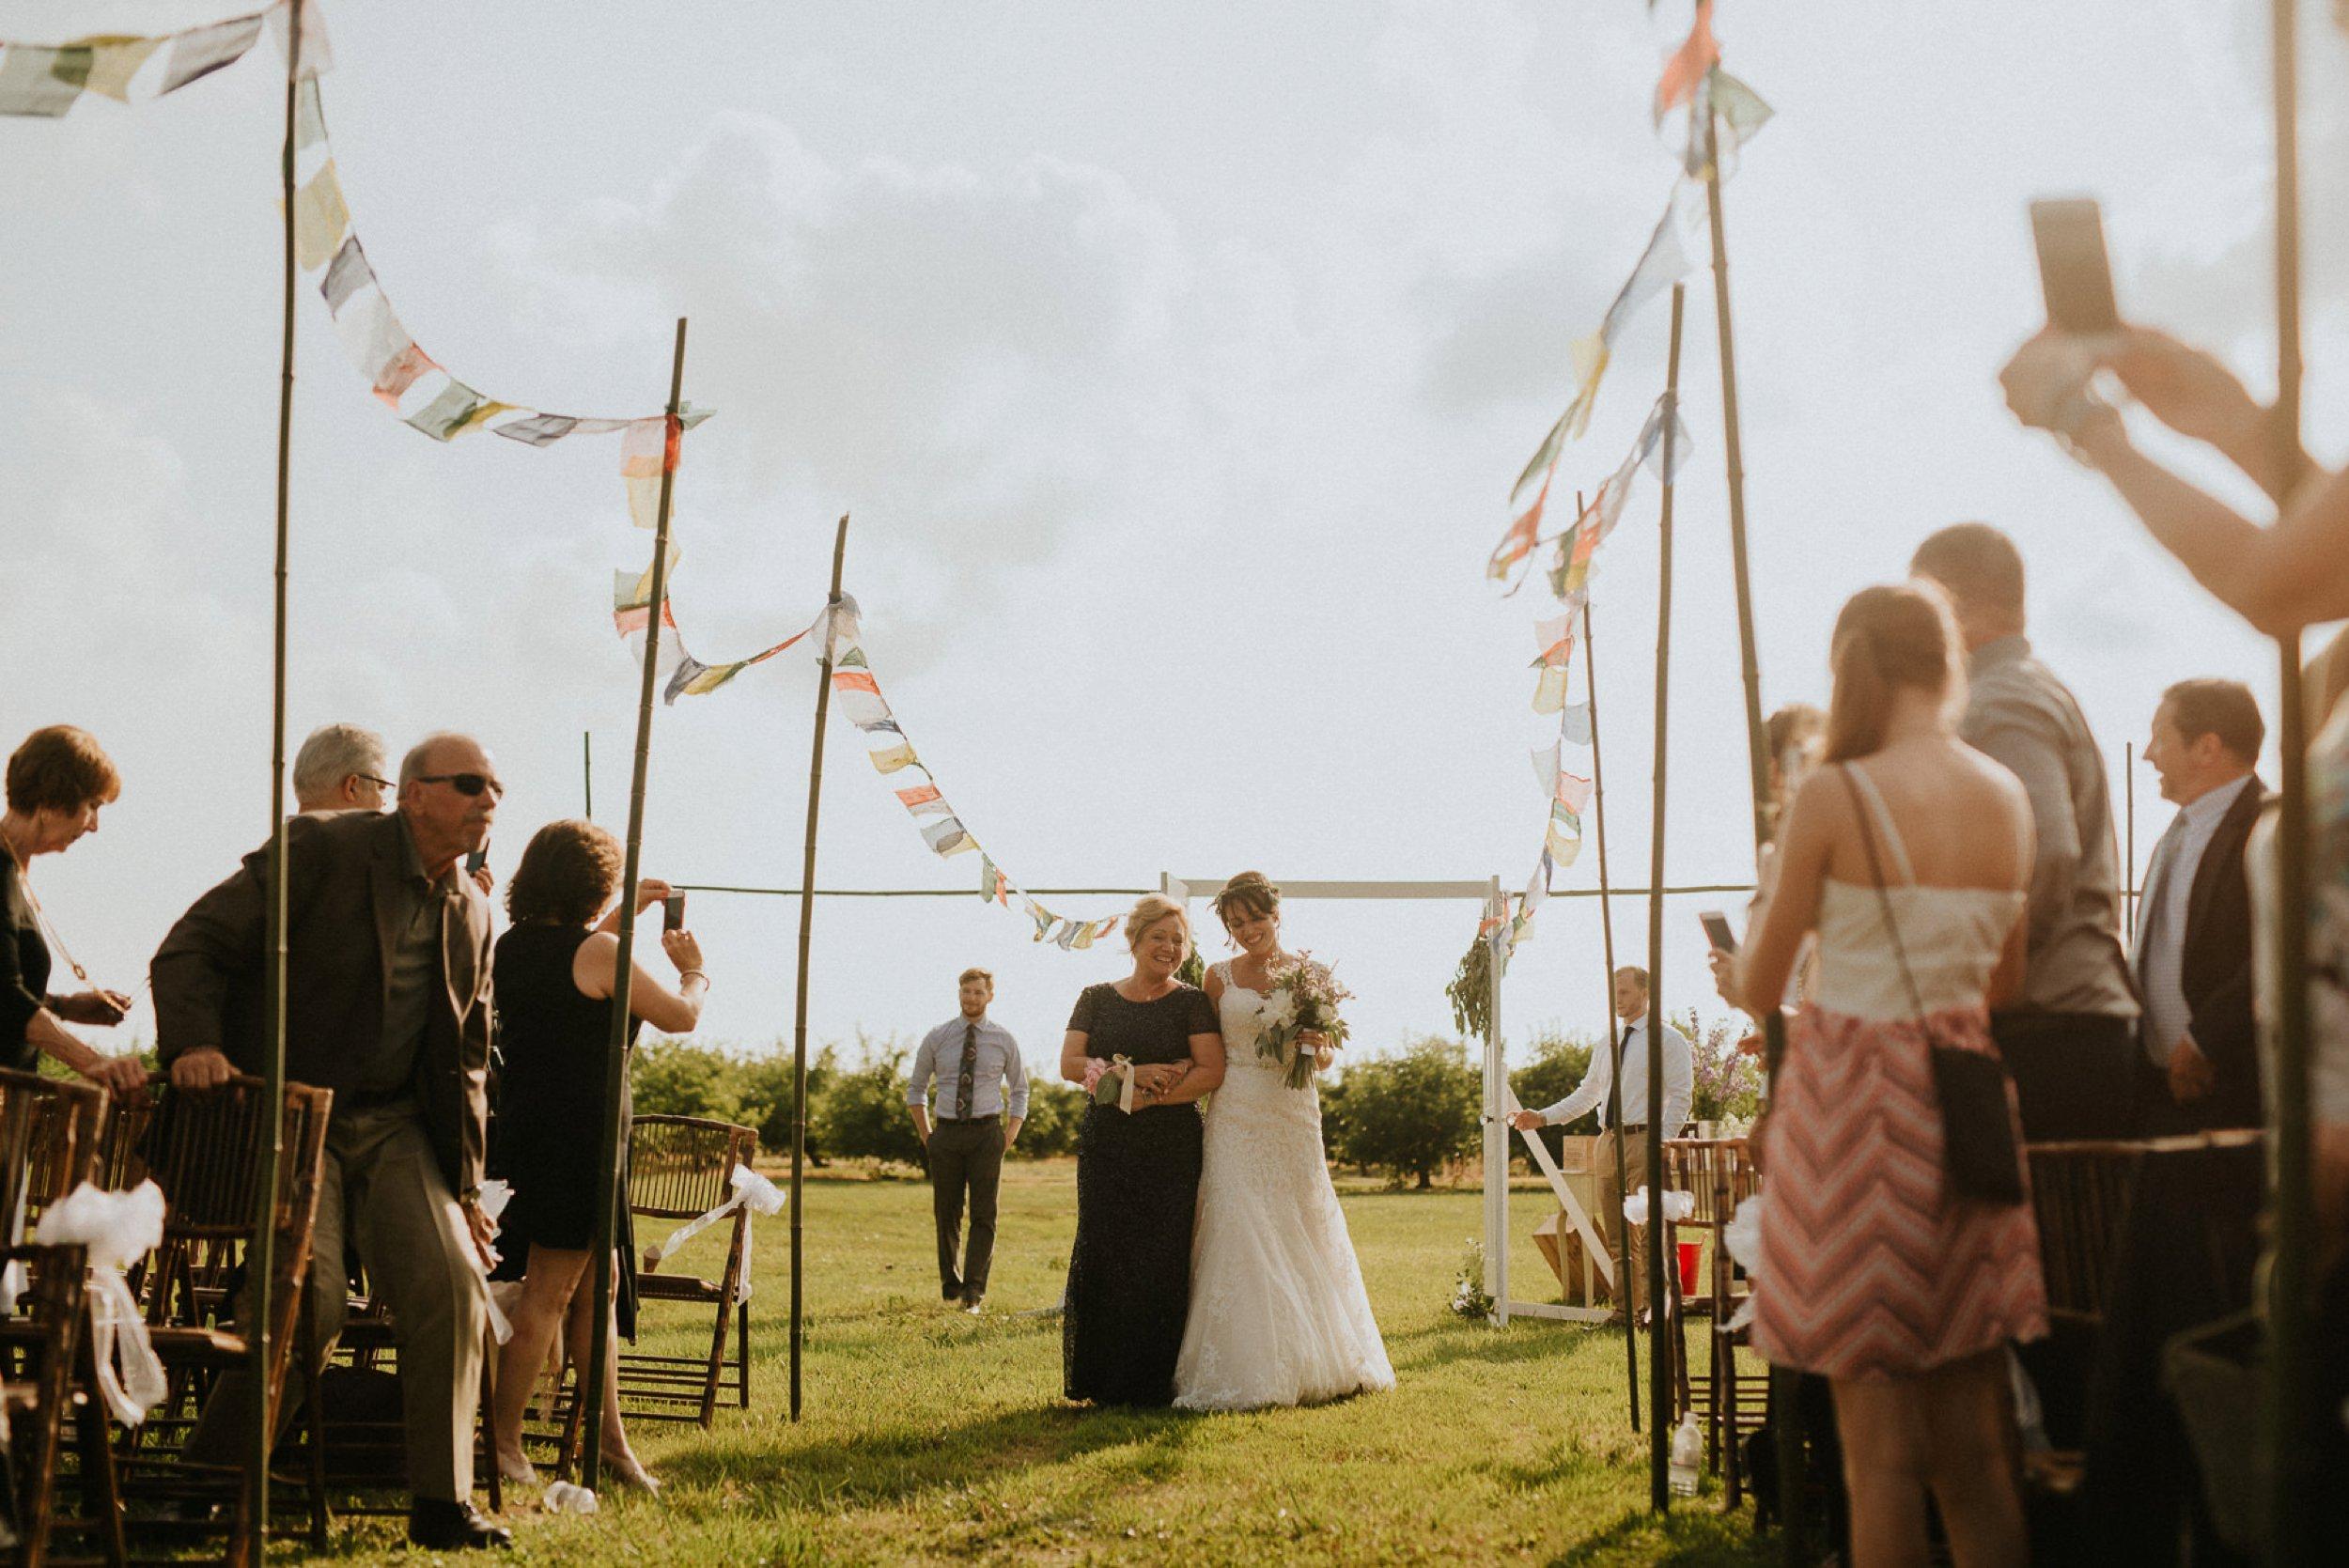 milburn_farms-wedding-31.jpg